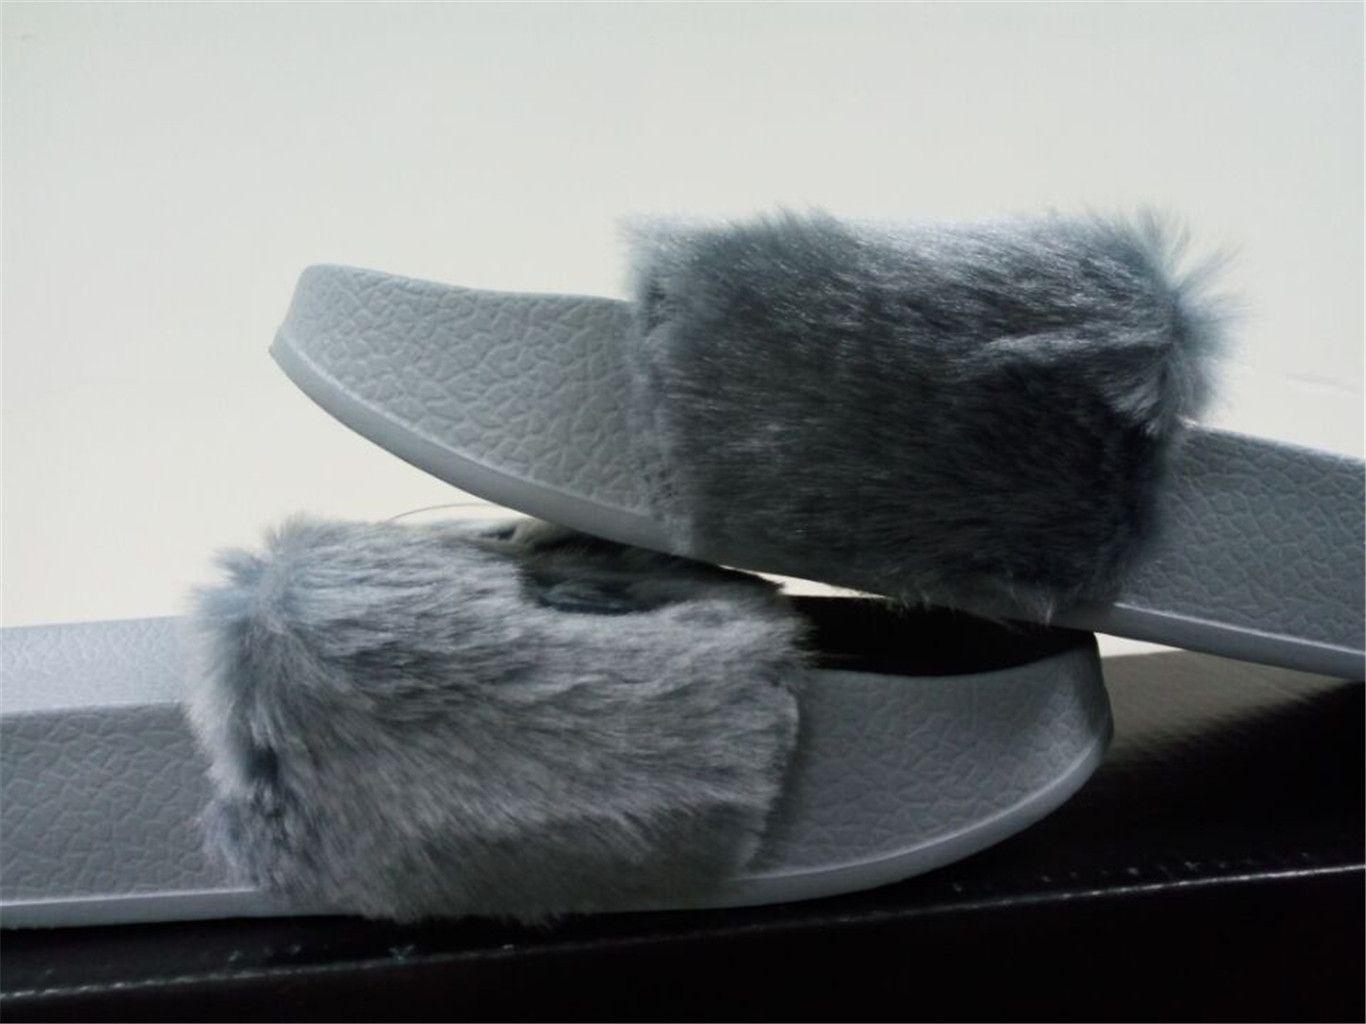 862532b94321 2018 Rihanna Fur Leadcat Fenty Slides Women Men Slippers House ...